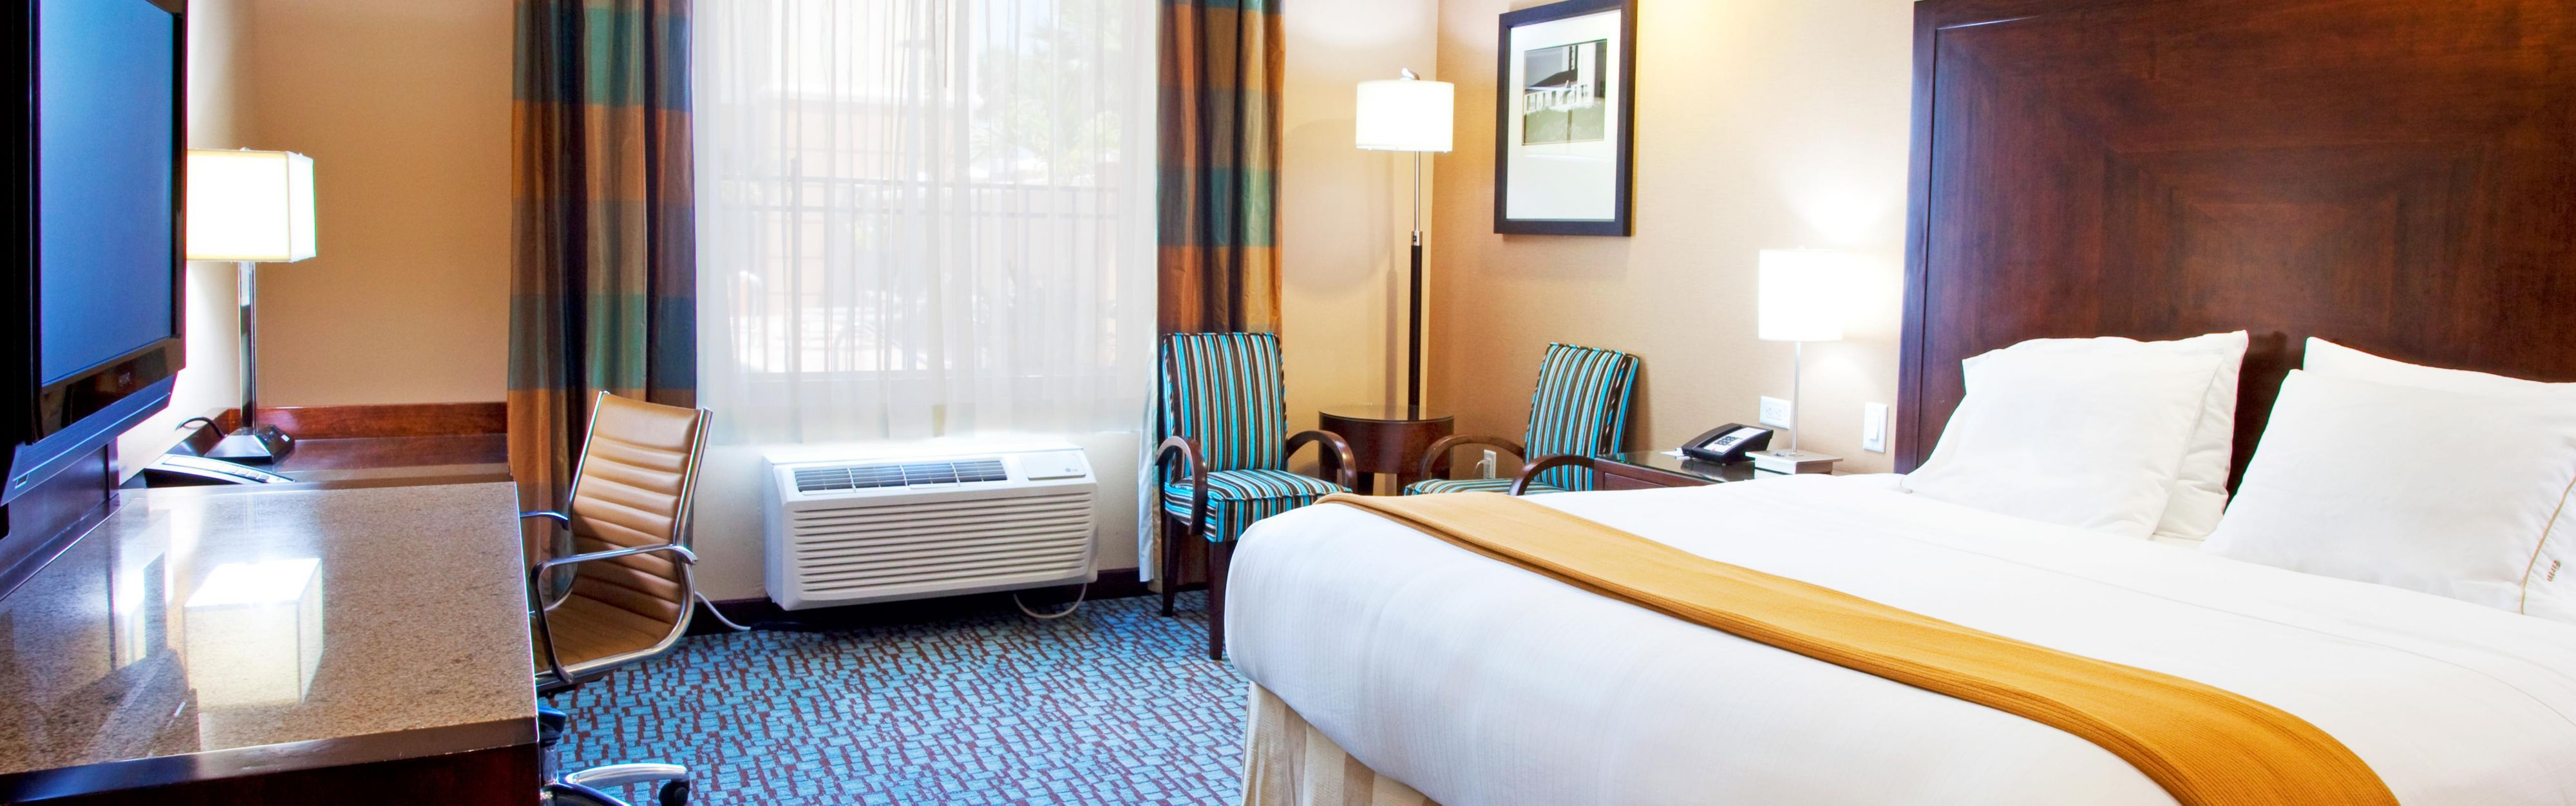 Holiday Inn Express Jacksonville Beach image 1